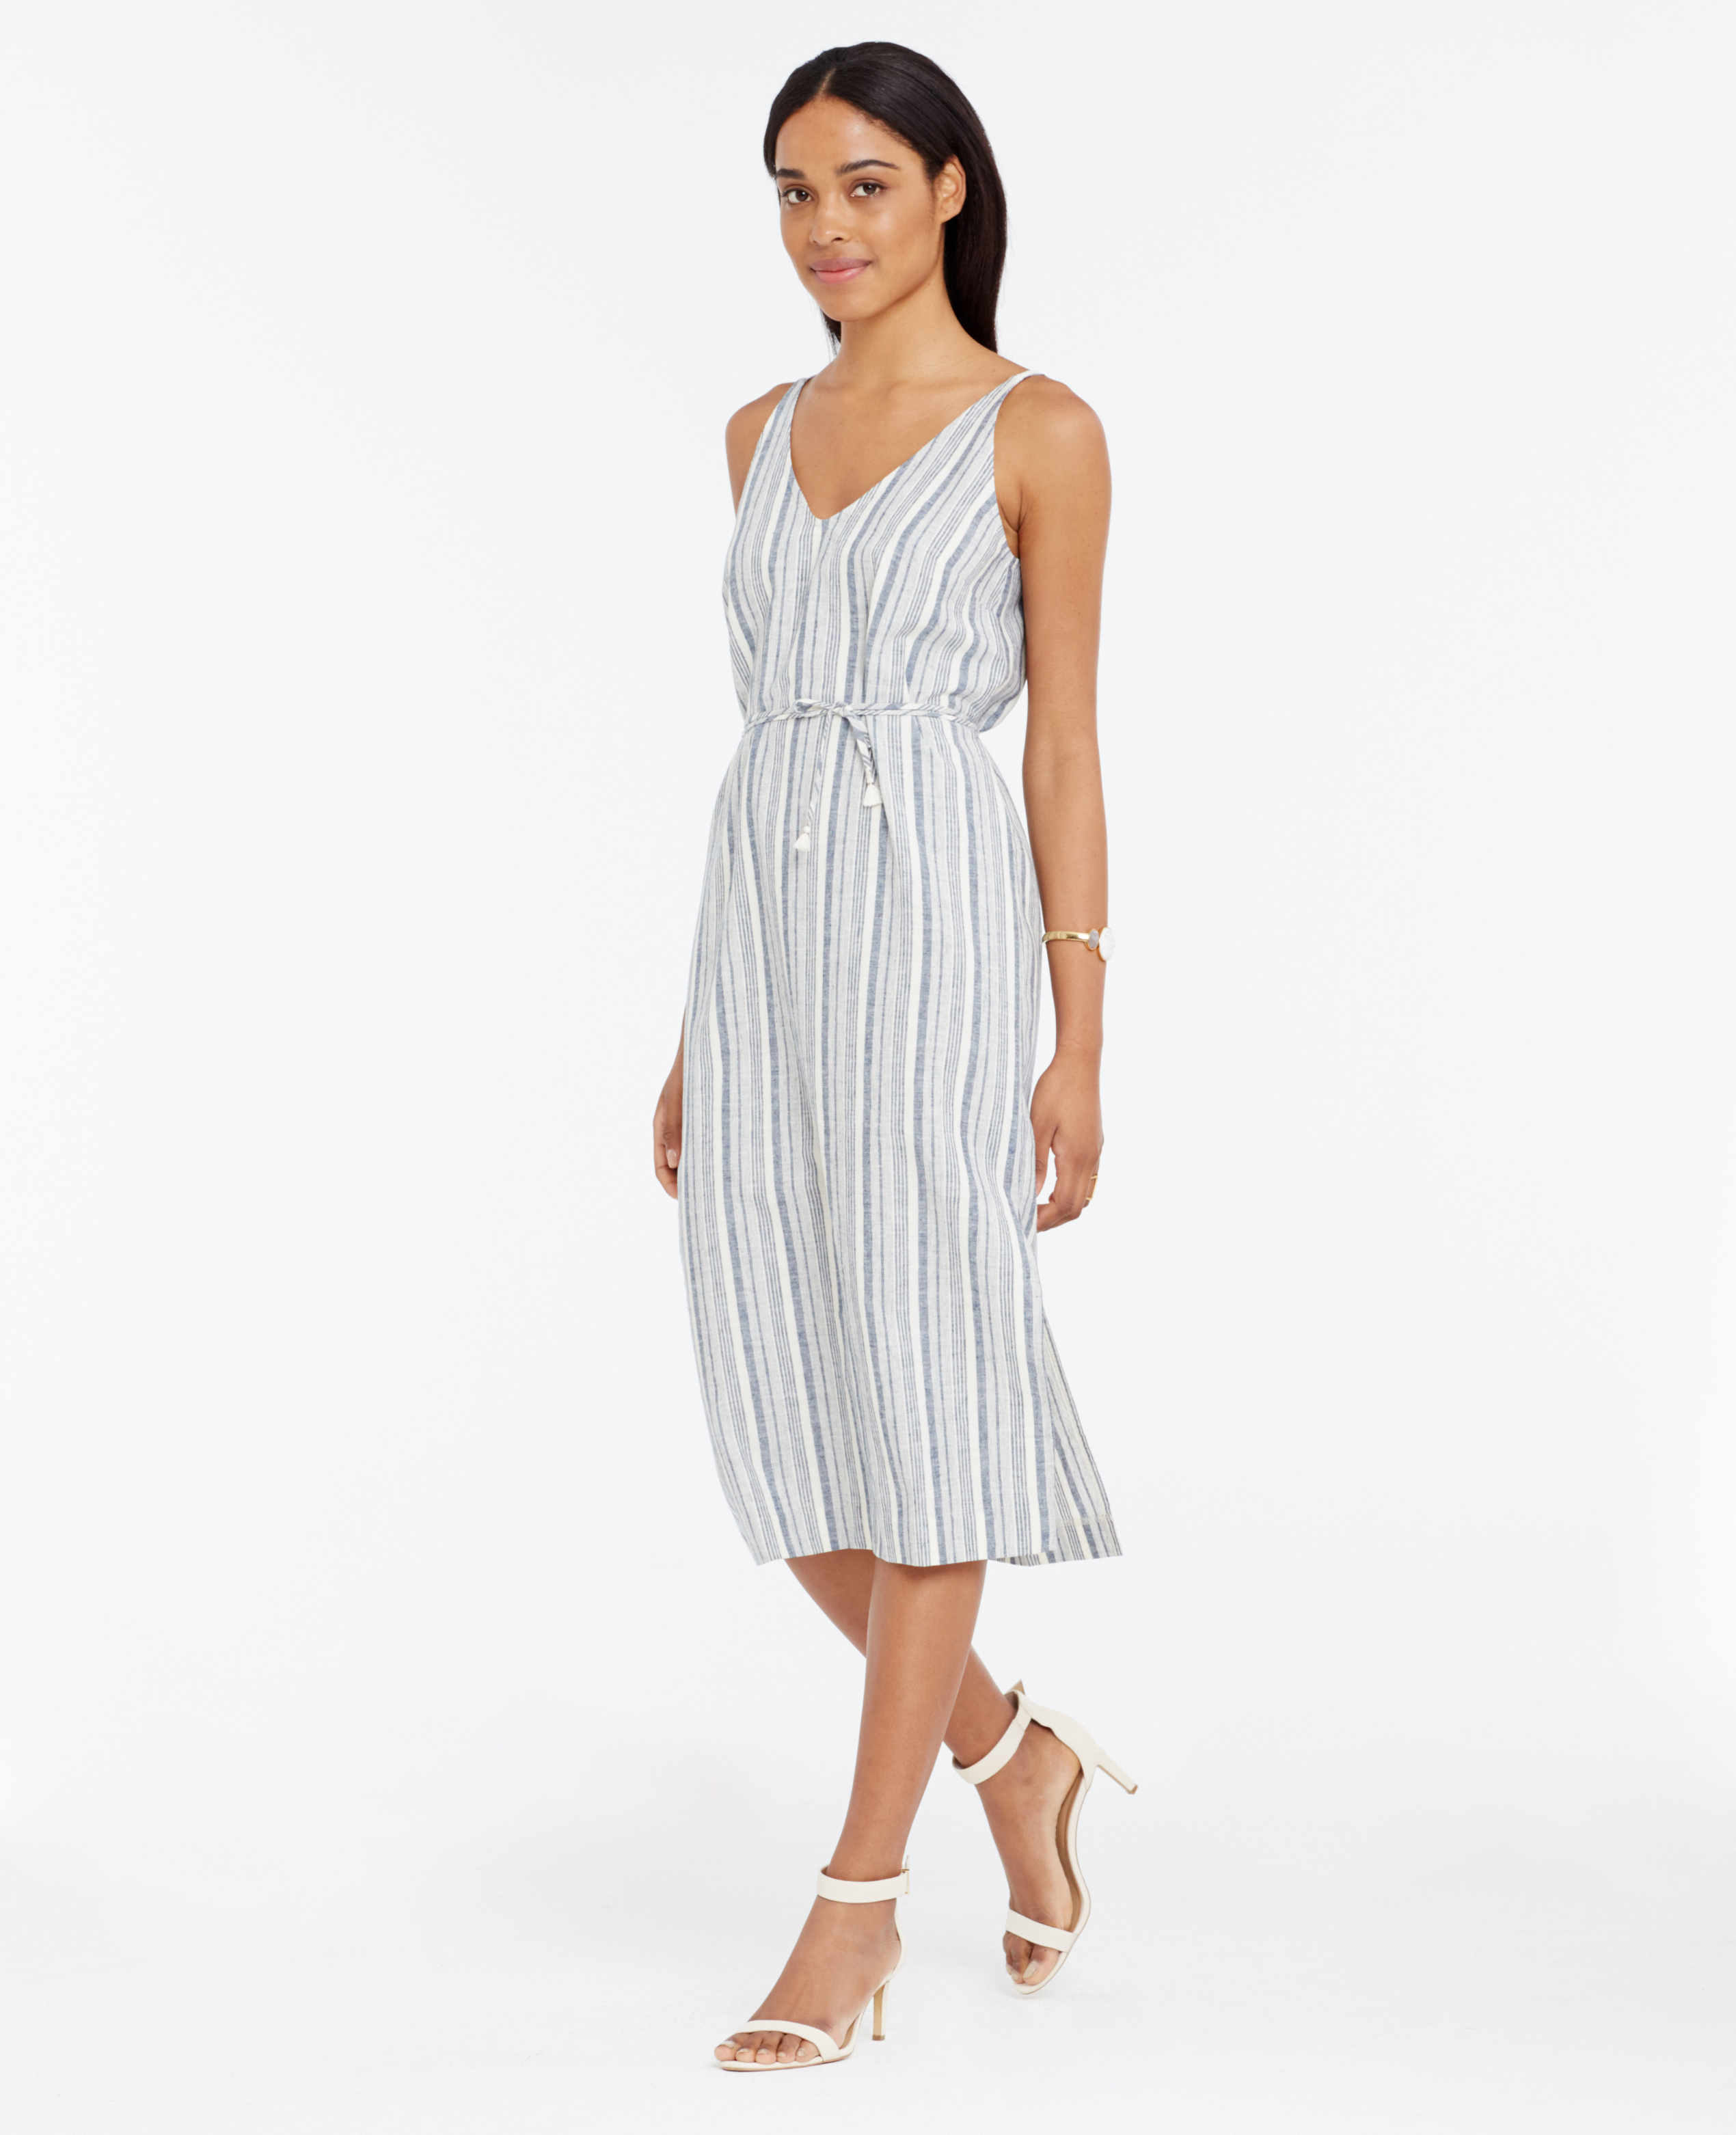 Lyst - Ann Taylor Petite Striped Linen Cotton Midi Dress in Blue